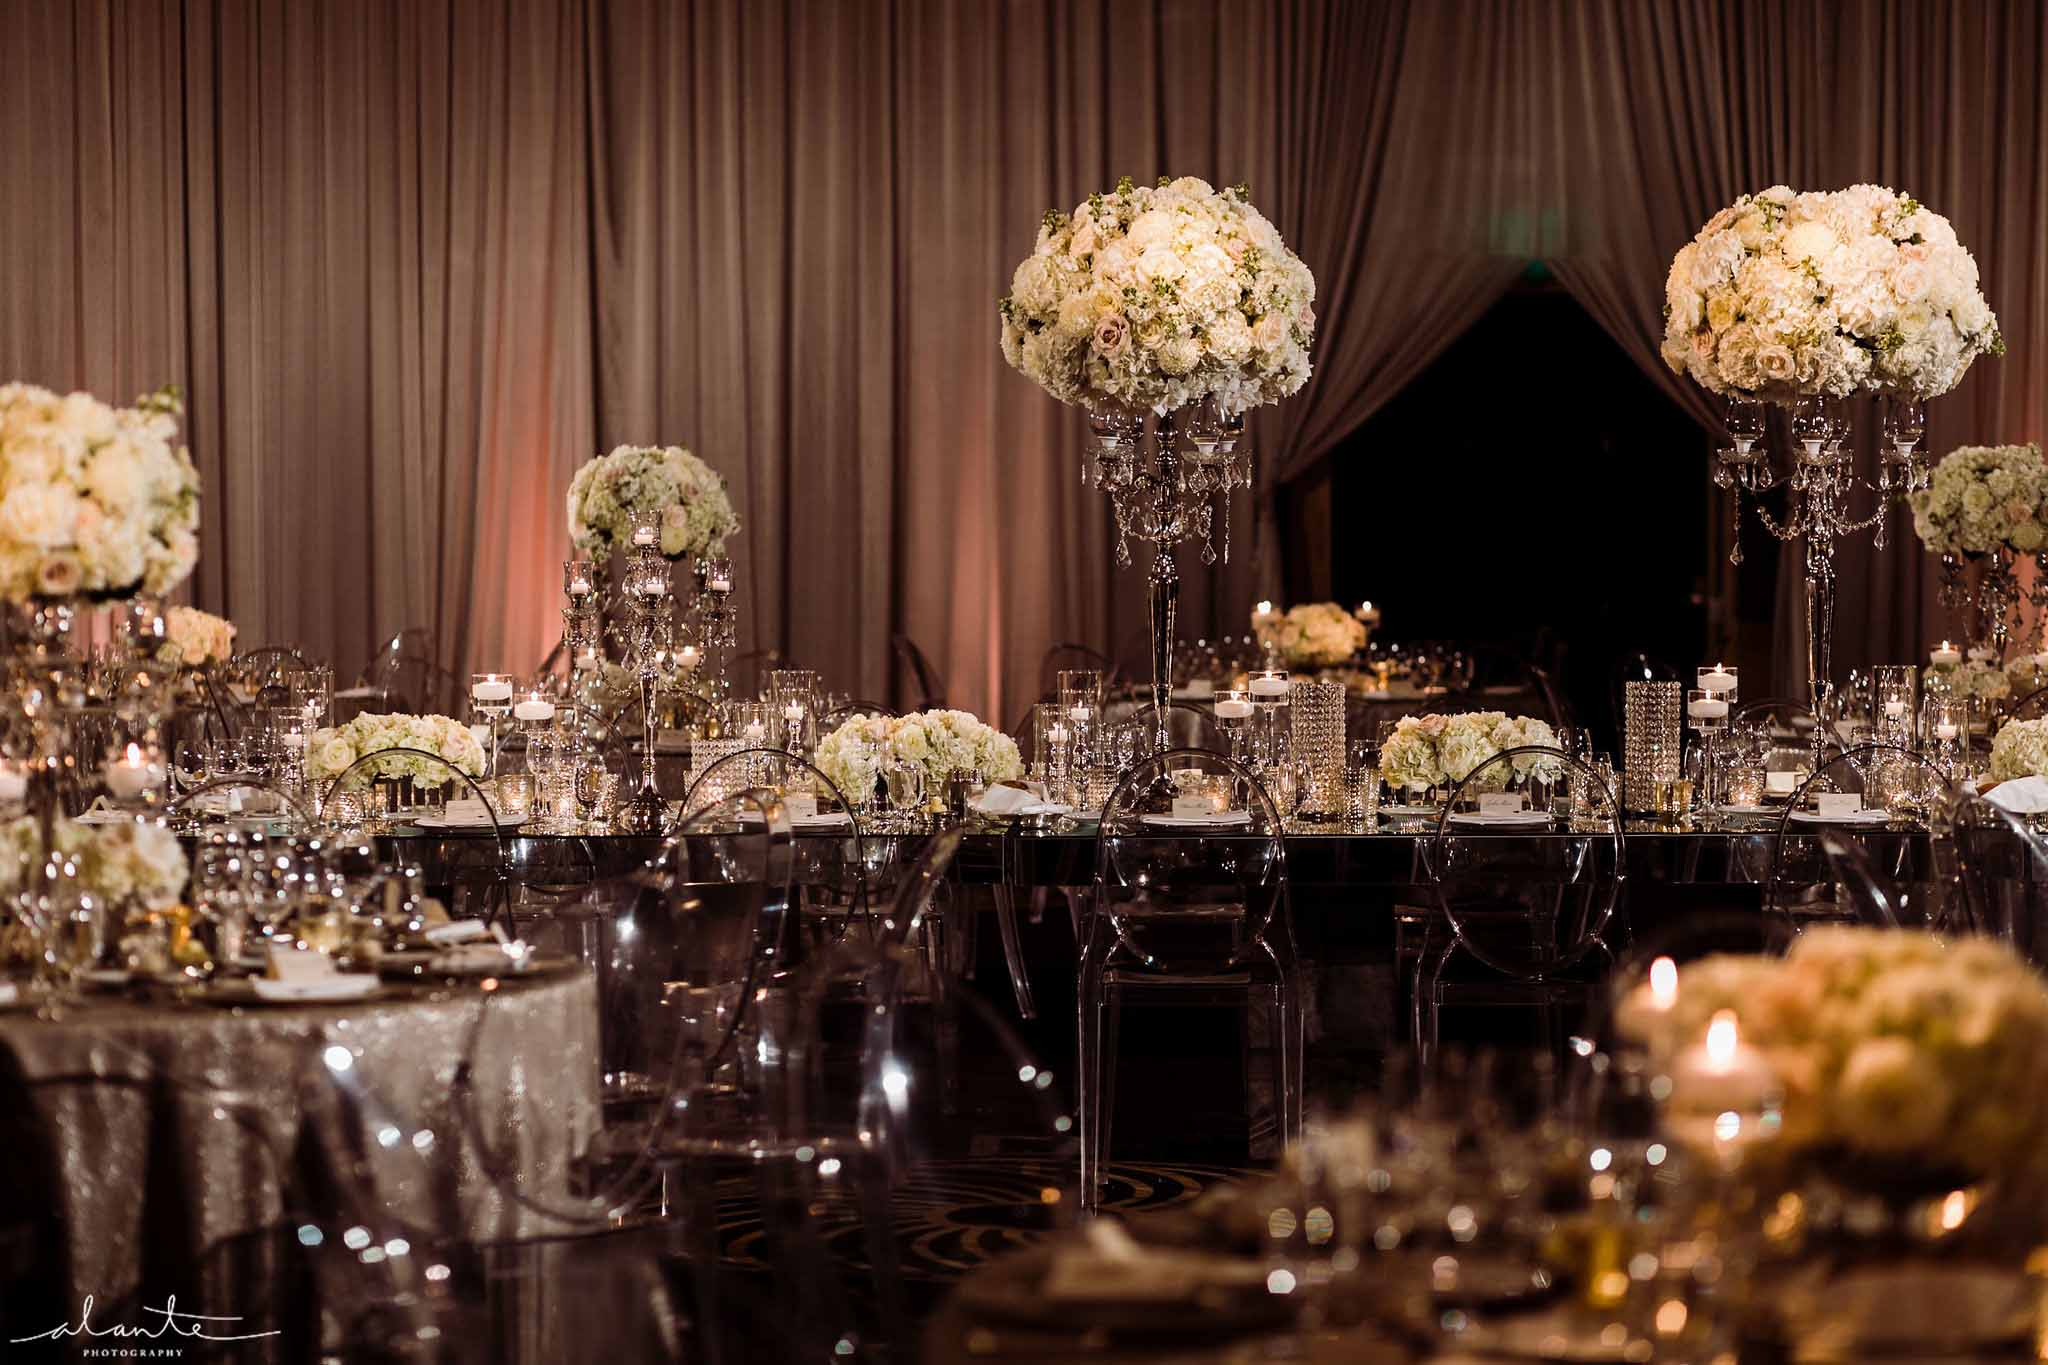 Four Seasons Seattle wedding with white centerpieces, designed by Flora Nova Design Seattle